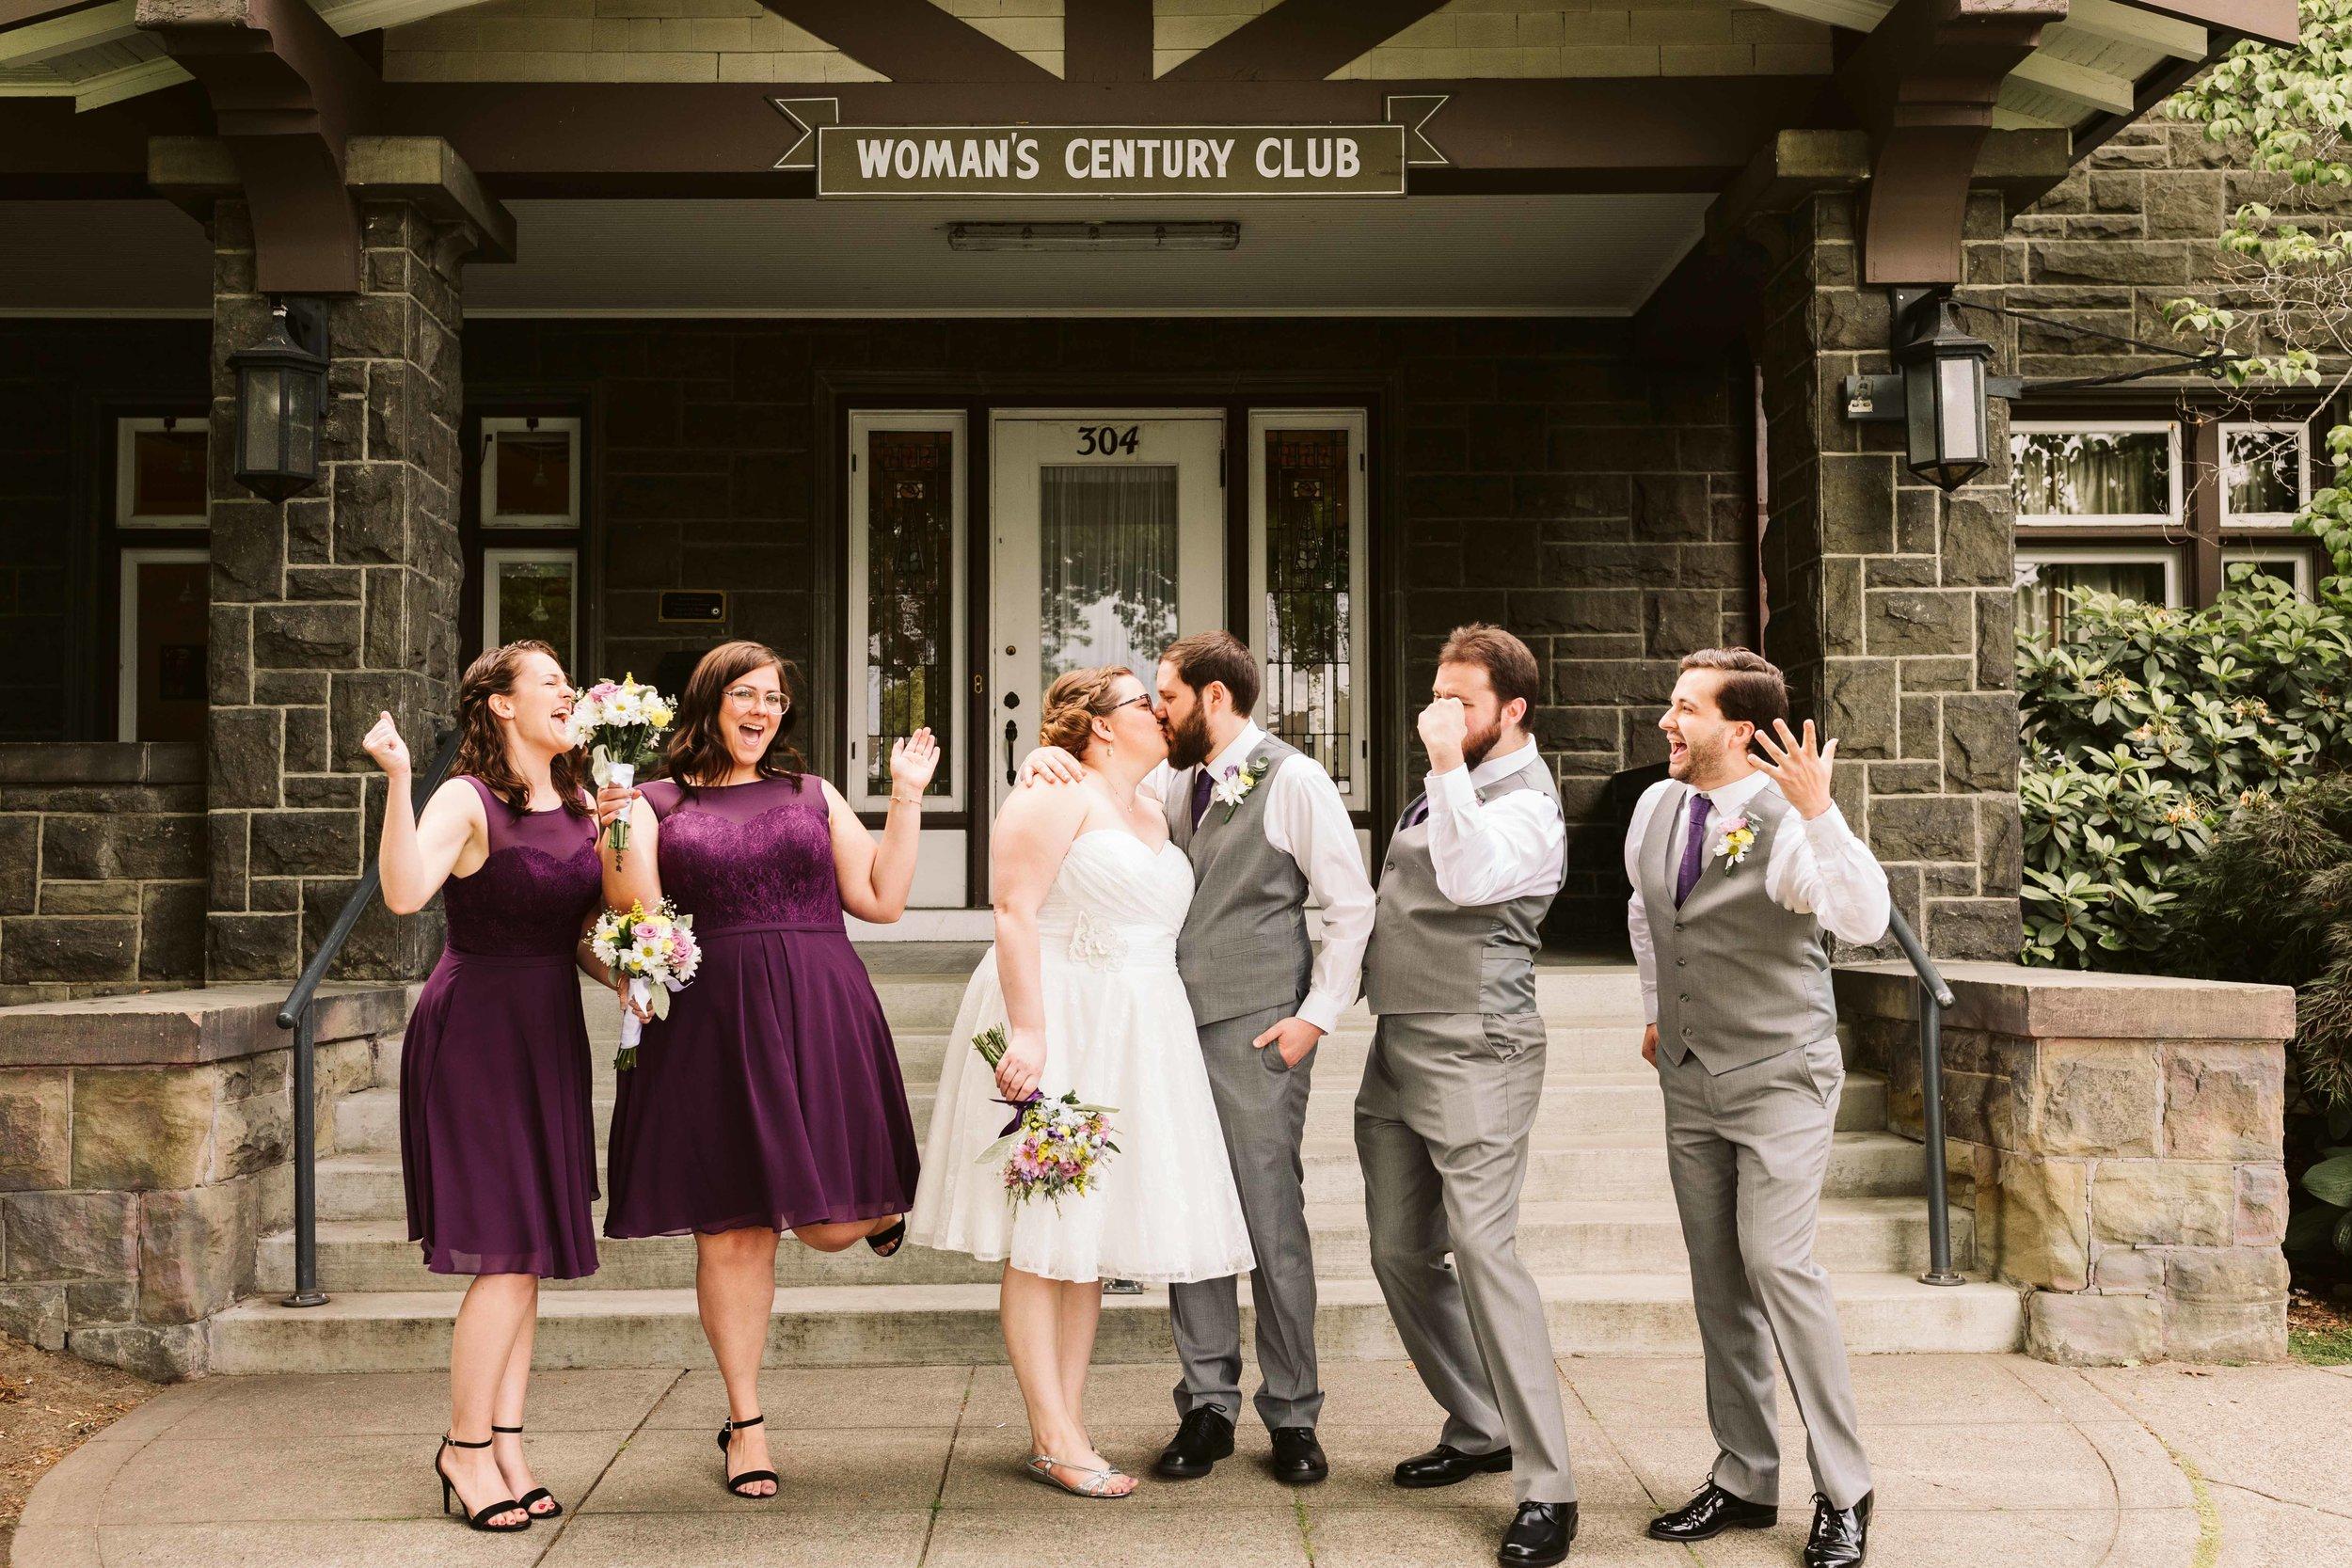 womens-century-club-wedding-37.jpg